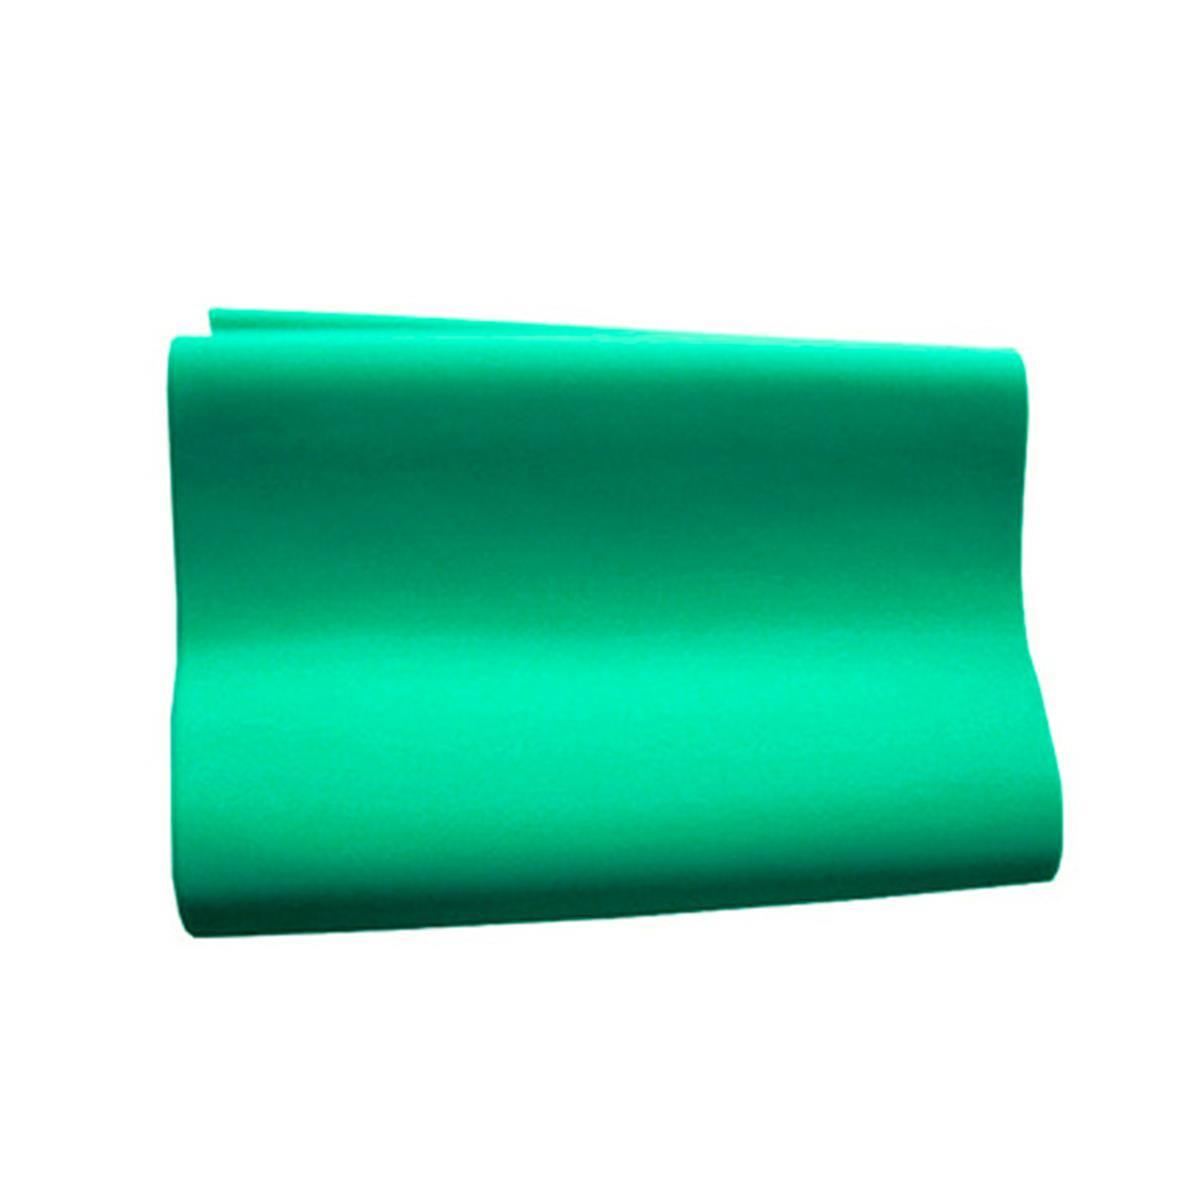 Faixa Elástica Thera Band - Verde Forte - 1M - Exercícios E Fisioterapia